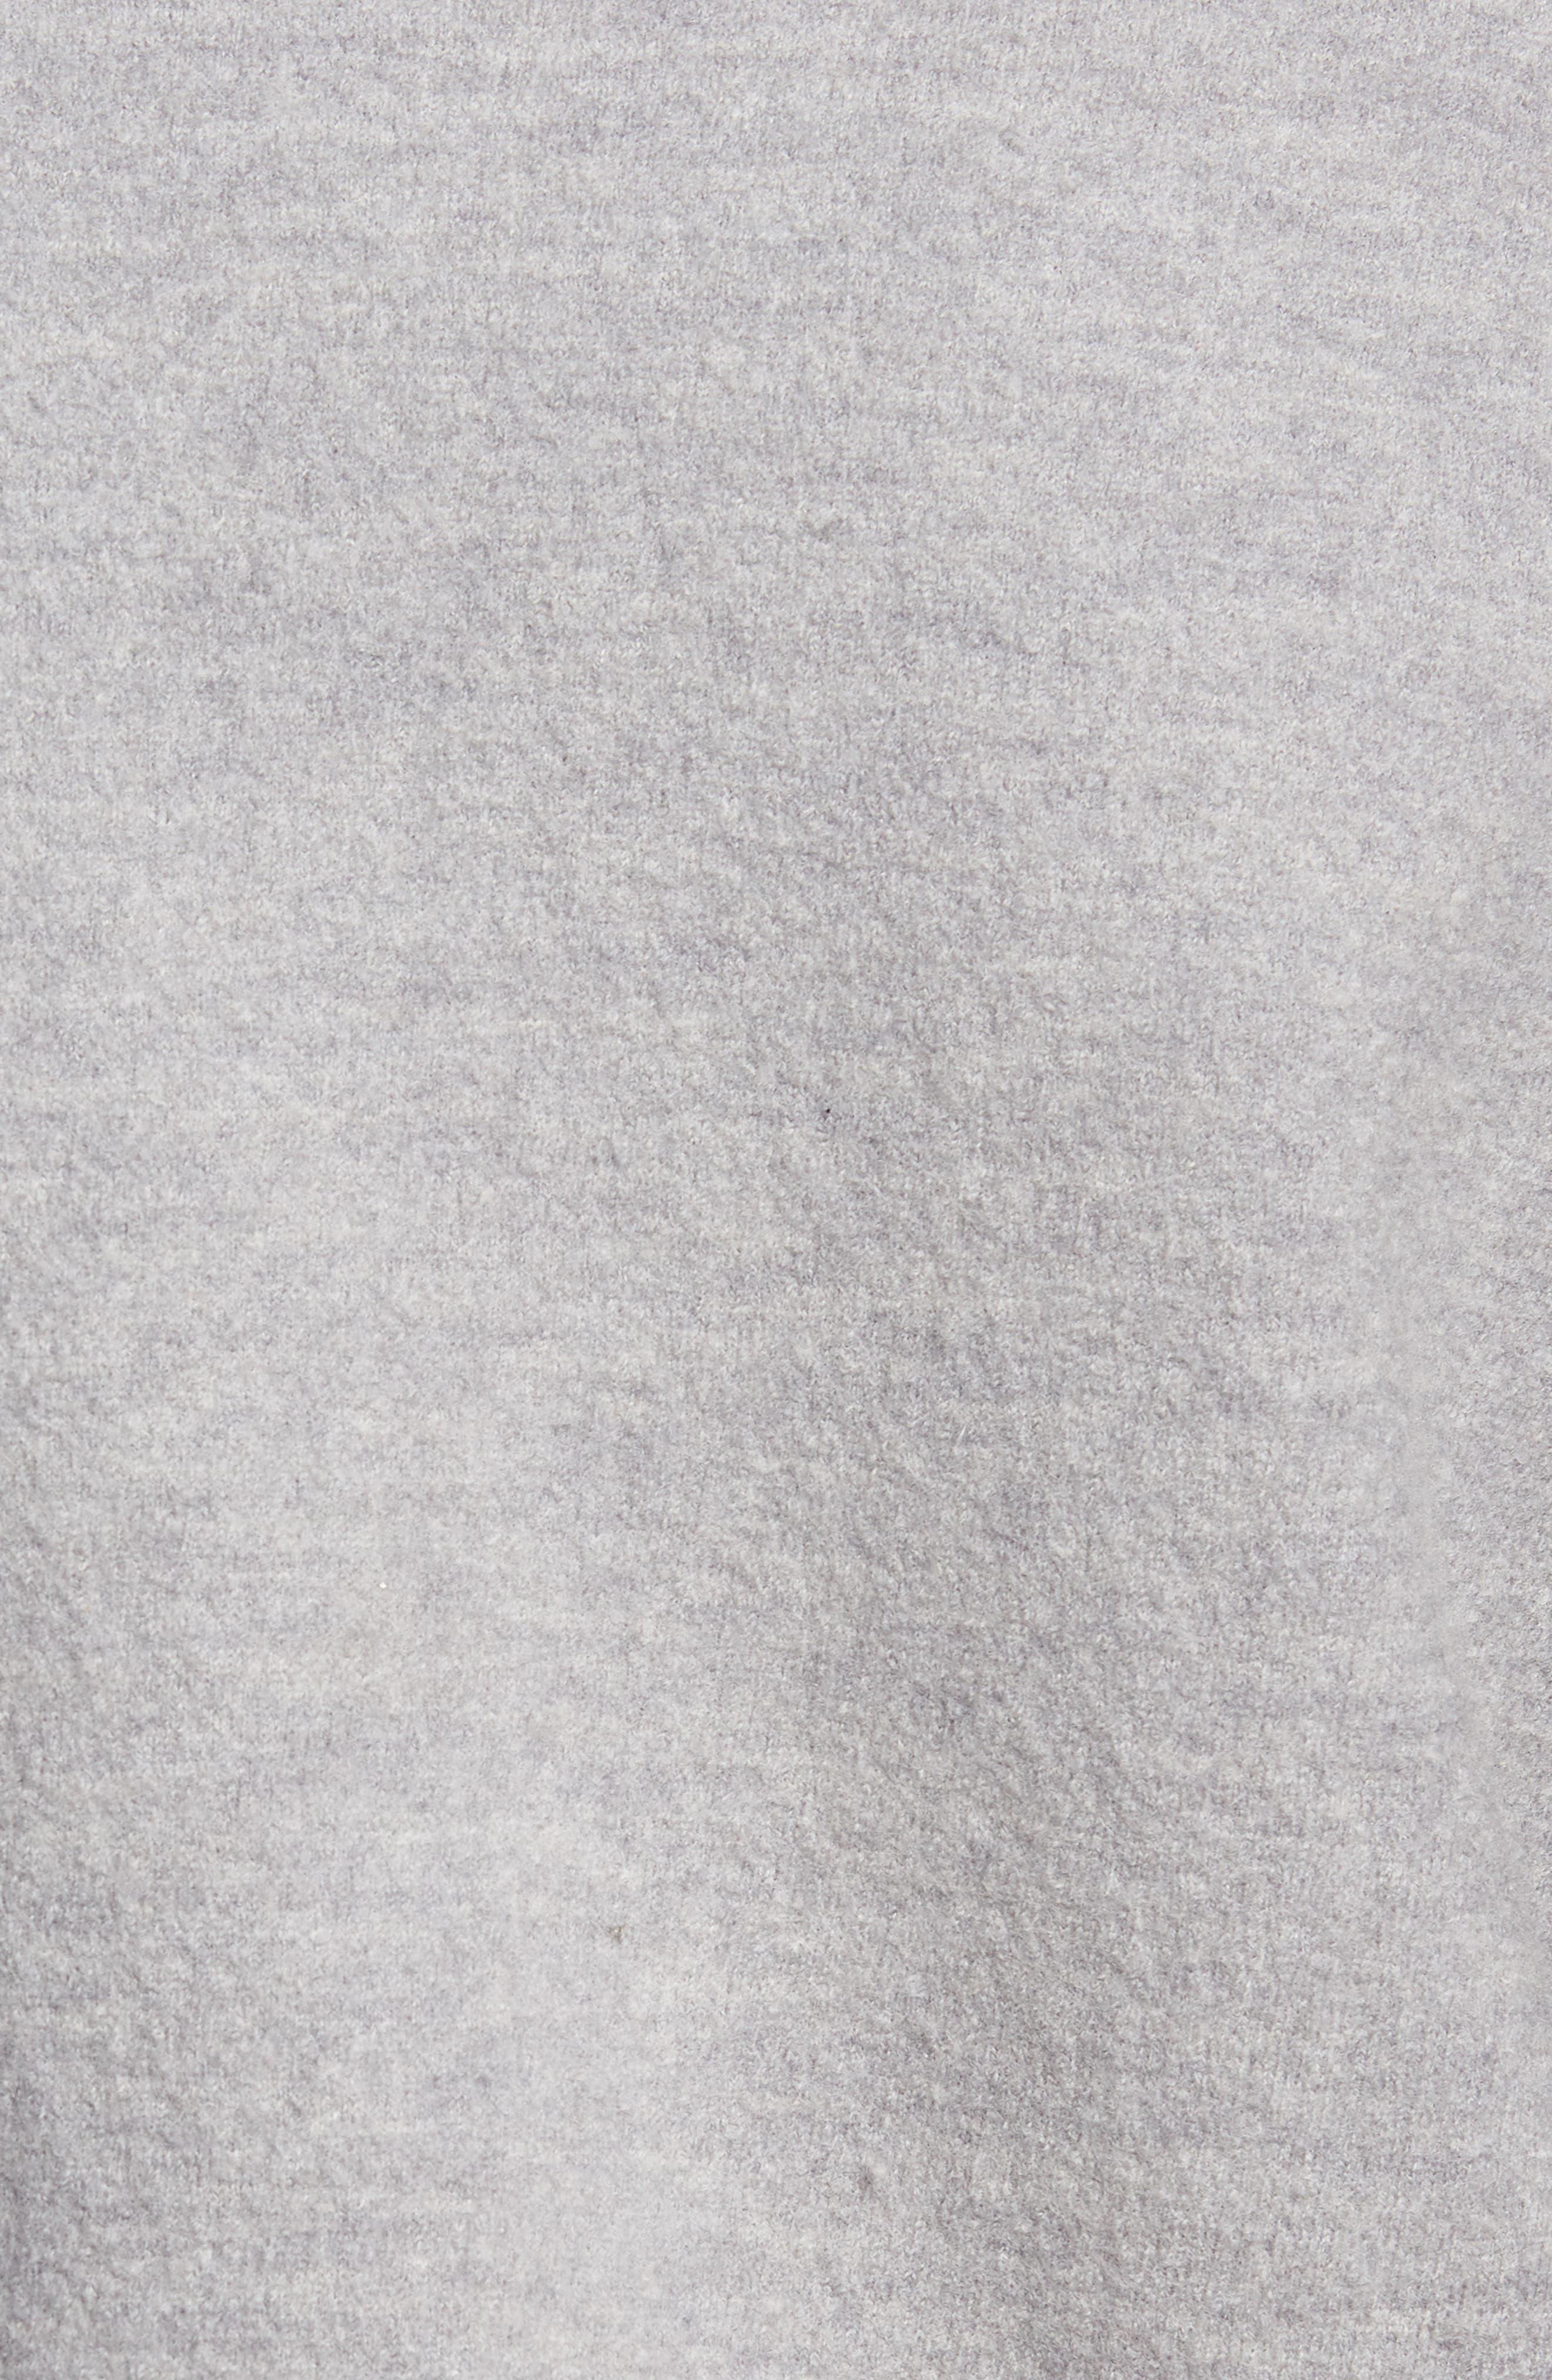 Felted Wool Bomber Jacket,                             Alternate thumbnail 6, color,                             LIGHT GREY MELANGE